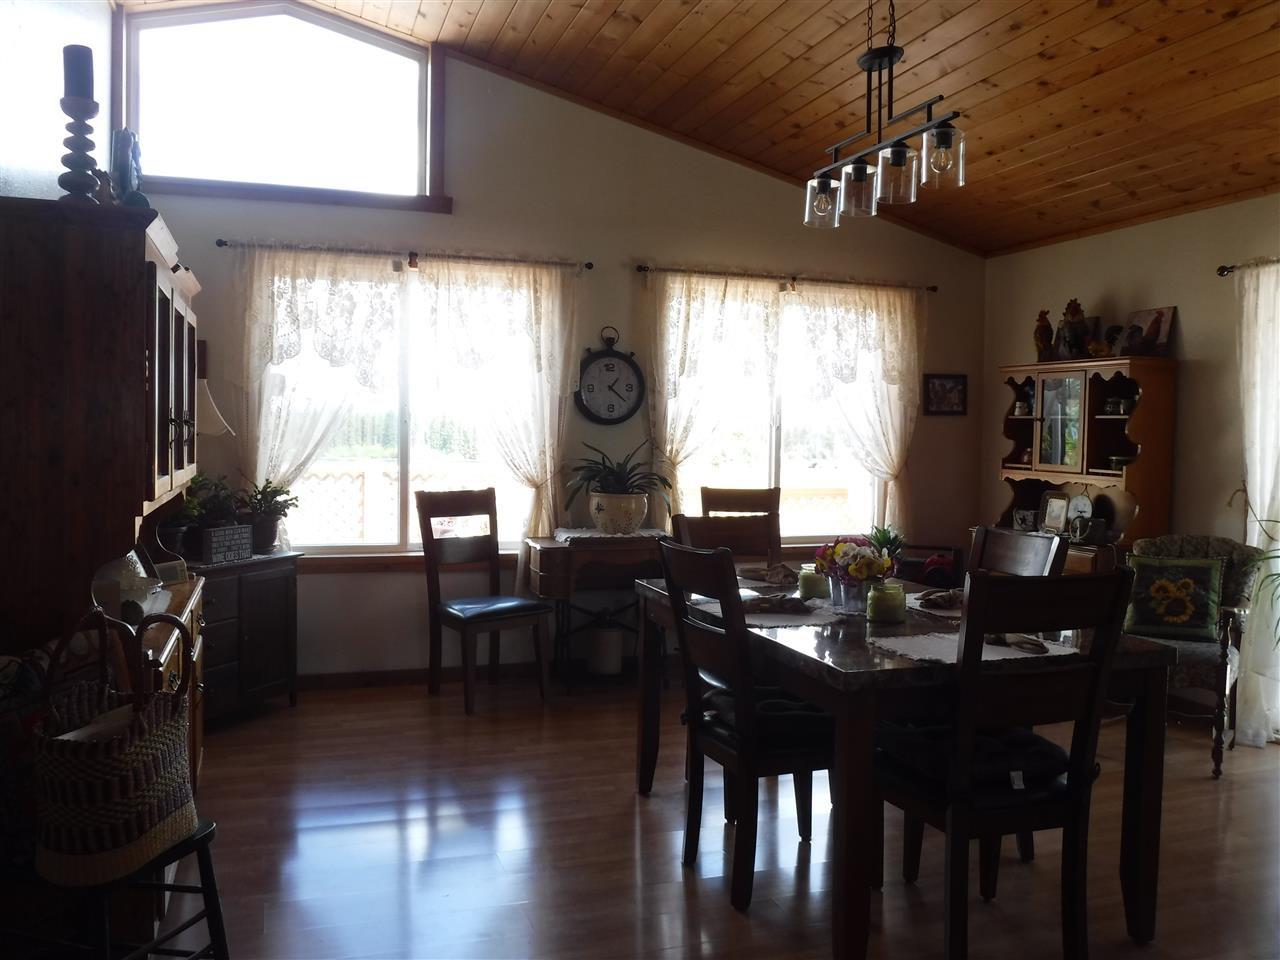 Photo 23: Photos: 3126 ELSEY Road in Williams Lake: Williams Lake - Rural West House for sale (Williams Lake (Zone 27))  : MLS®# R2467730